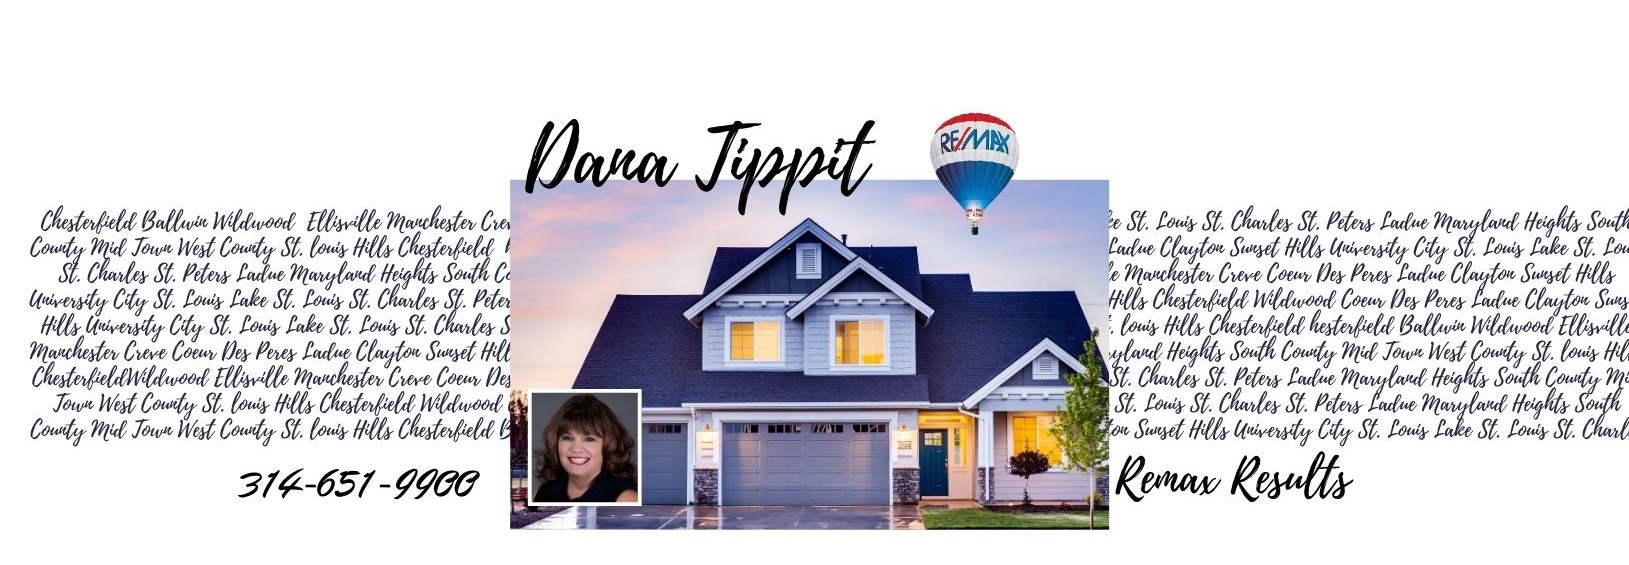 Dana Tippit Luxury Home Marketing Specialist REMAX Chesterfield Wildwood REMAX